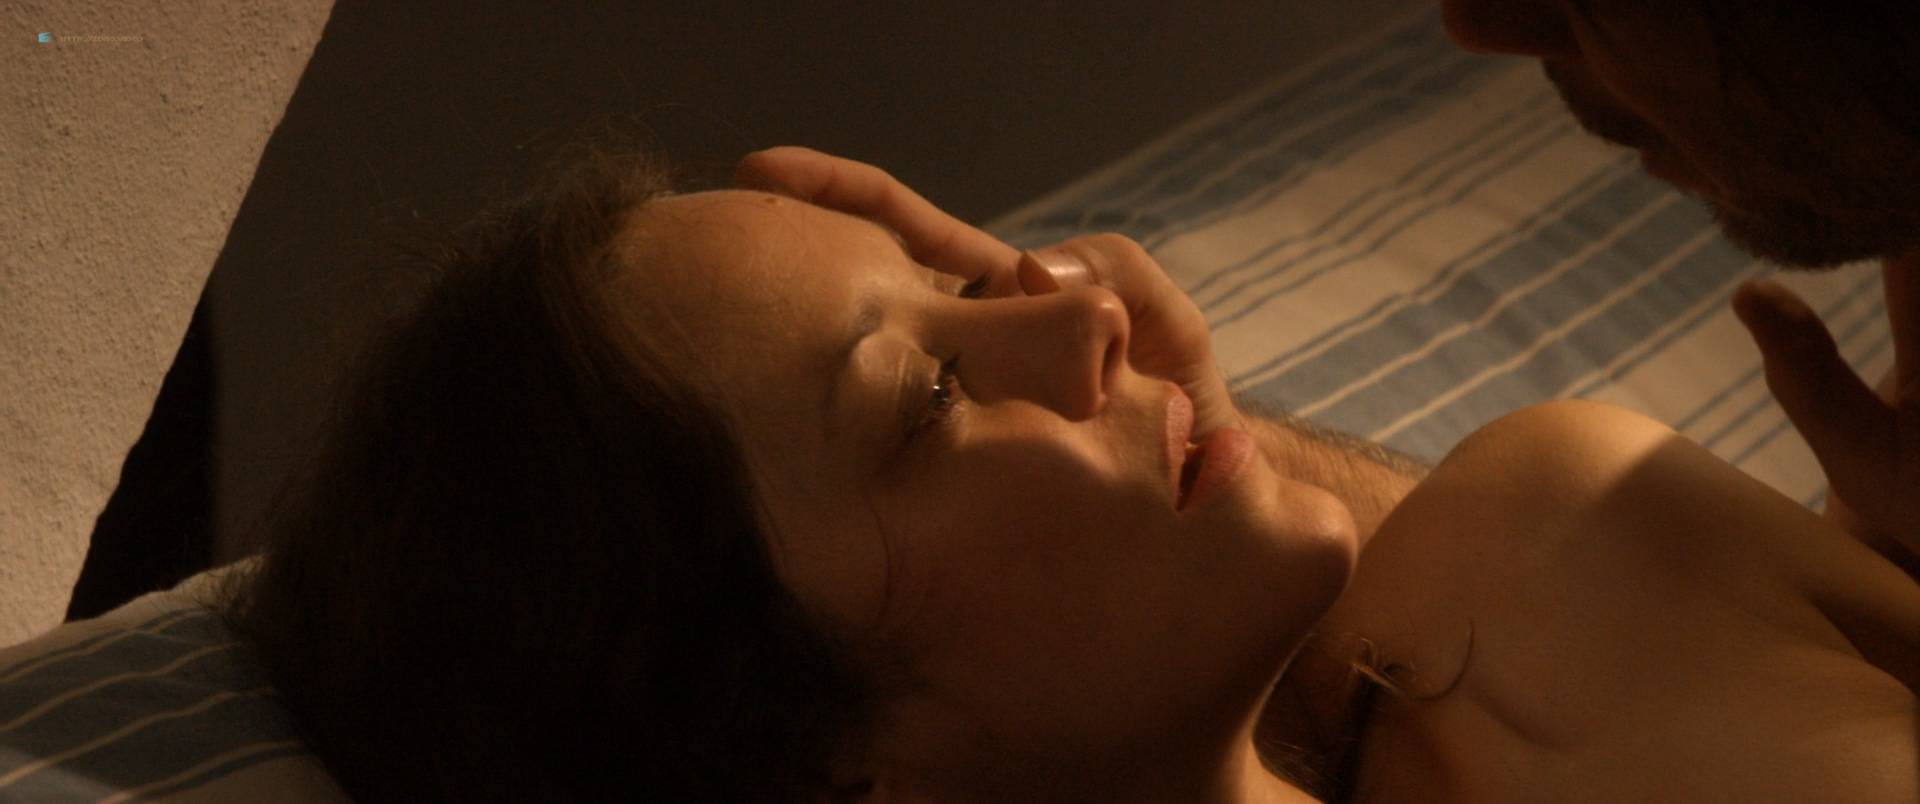 Marion-Cotillard-nude-full-frontal-Alba-Rohrwacher-nude-nipple-Les-fantomes-d_Ismael-FR-2017-HD-1080p-BluRay-013.jpg